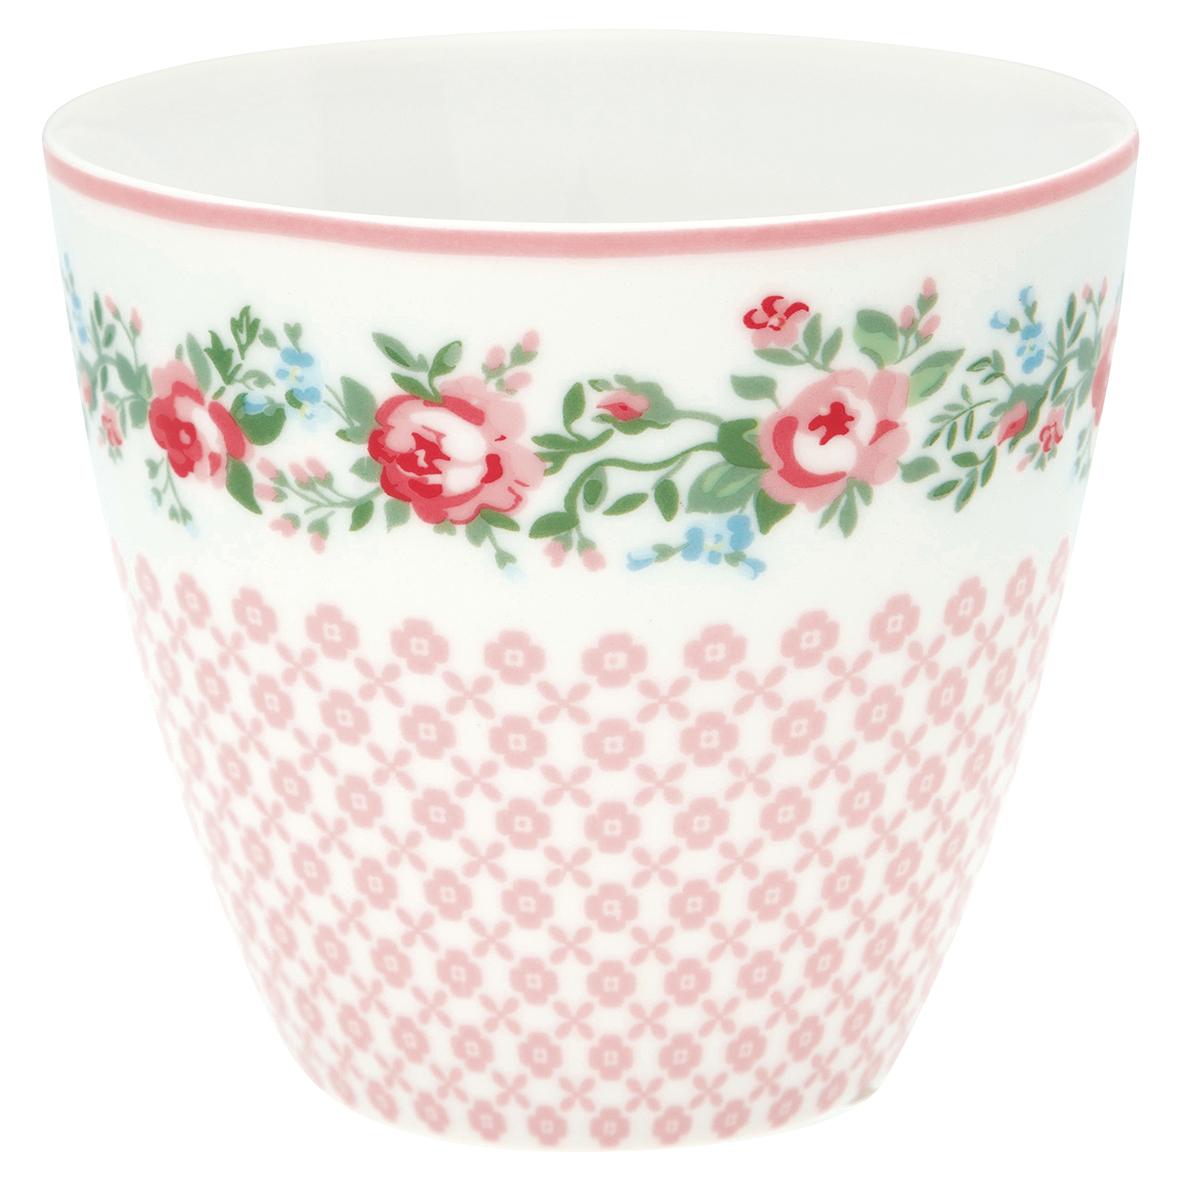 GreenGate Latte Cup Gabby White